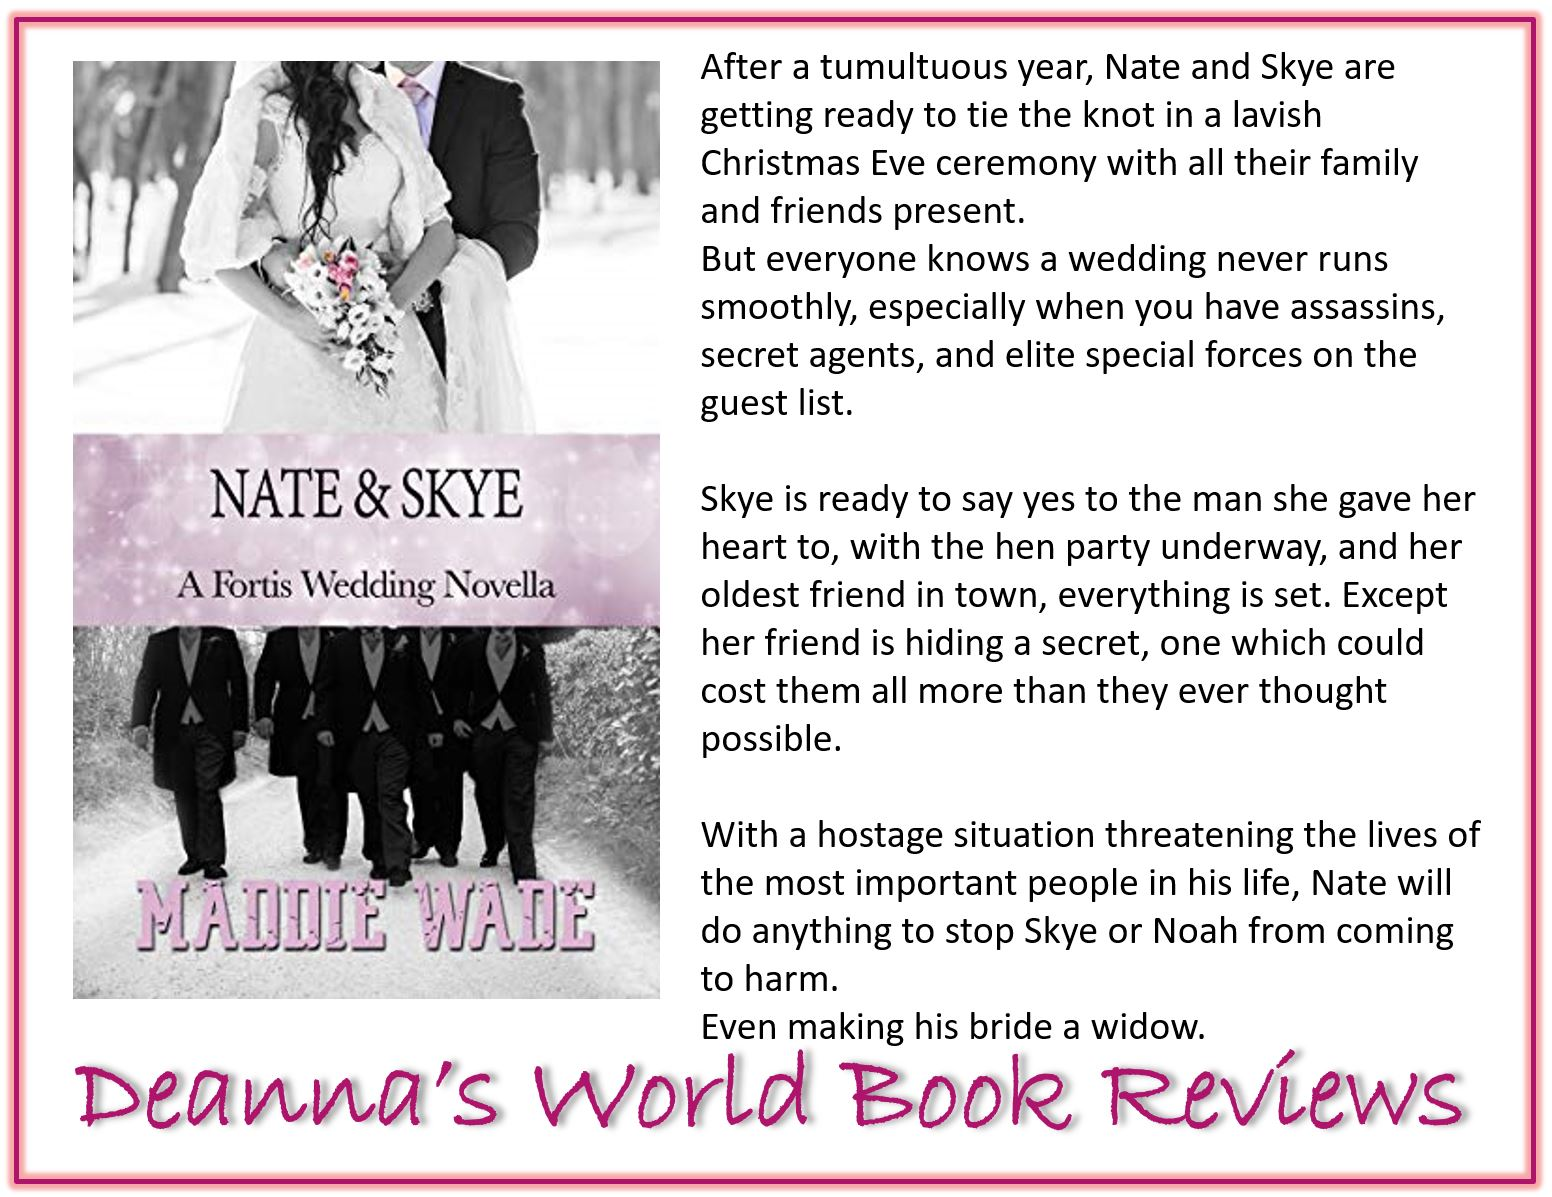 Nate and Skye by Maddie Wade blurb